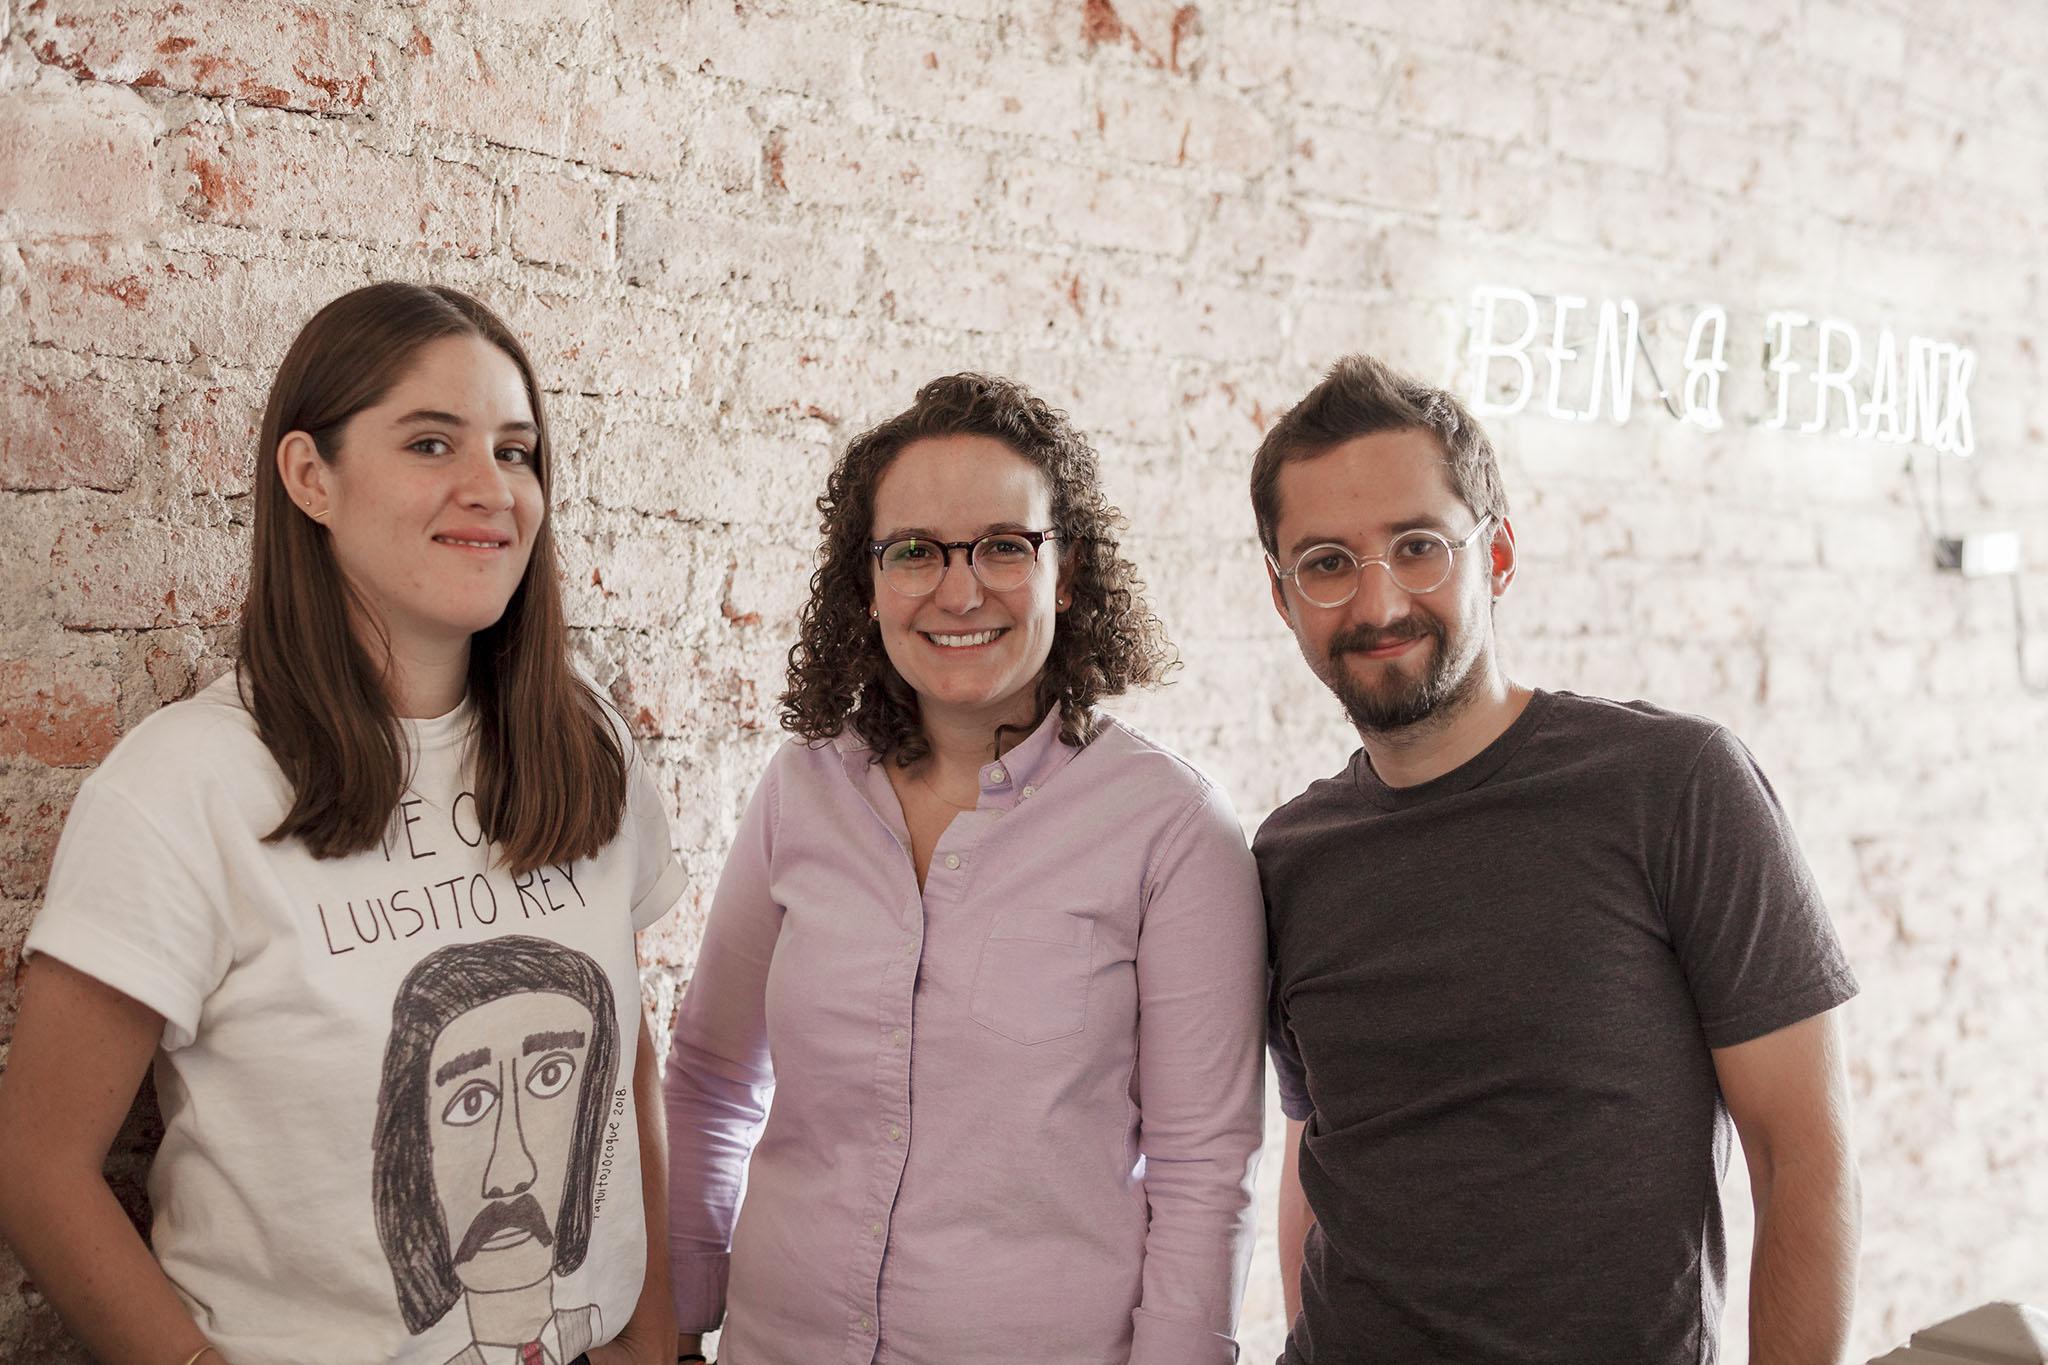 (Co-founders Maria Jose, Mariana Castillo, Eduardo Paulsen)